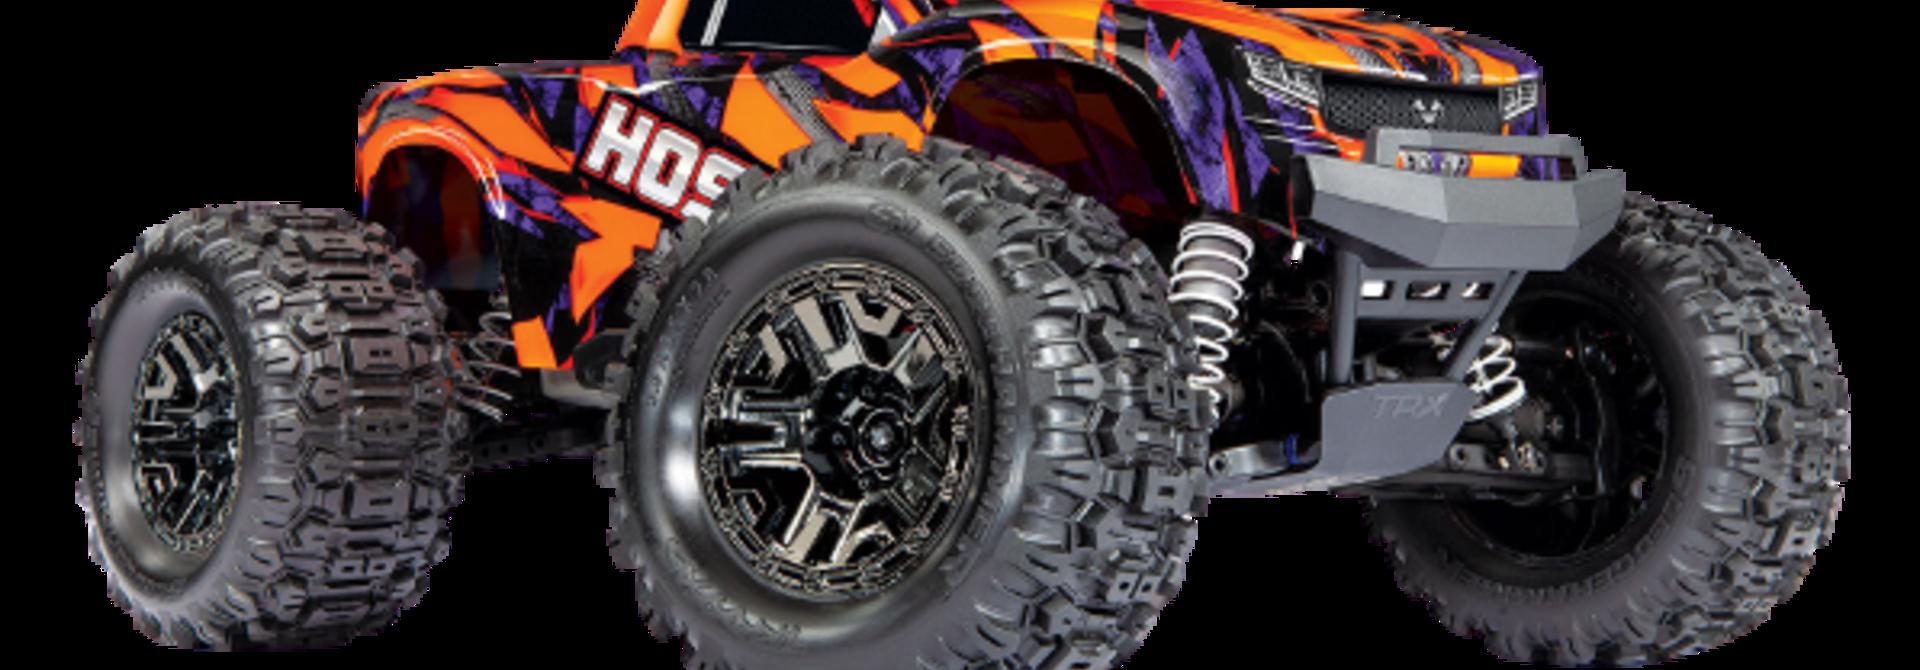 Traxxas Hoss 1/10 Scale 4WD Brushless Electric Monster Truck, VXL-3S, TQi - Orange TRX90076-4O